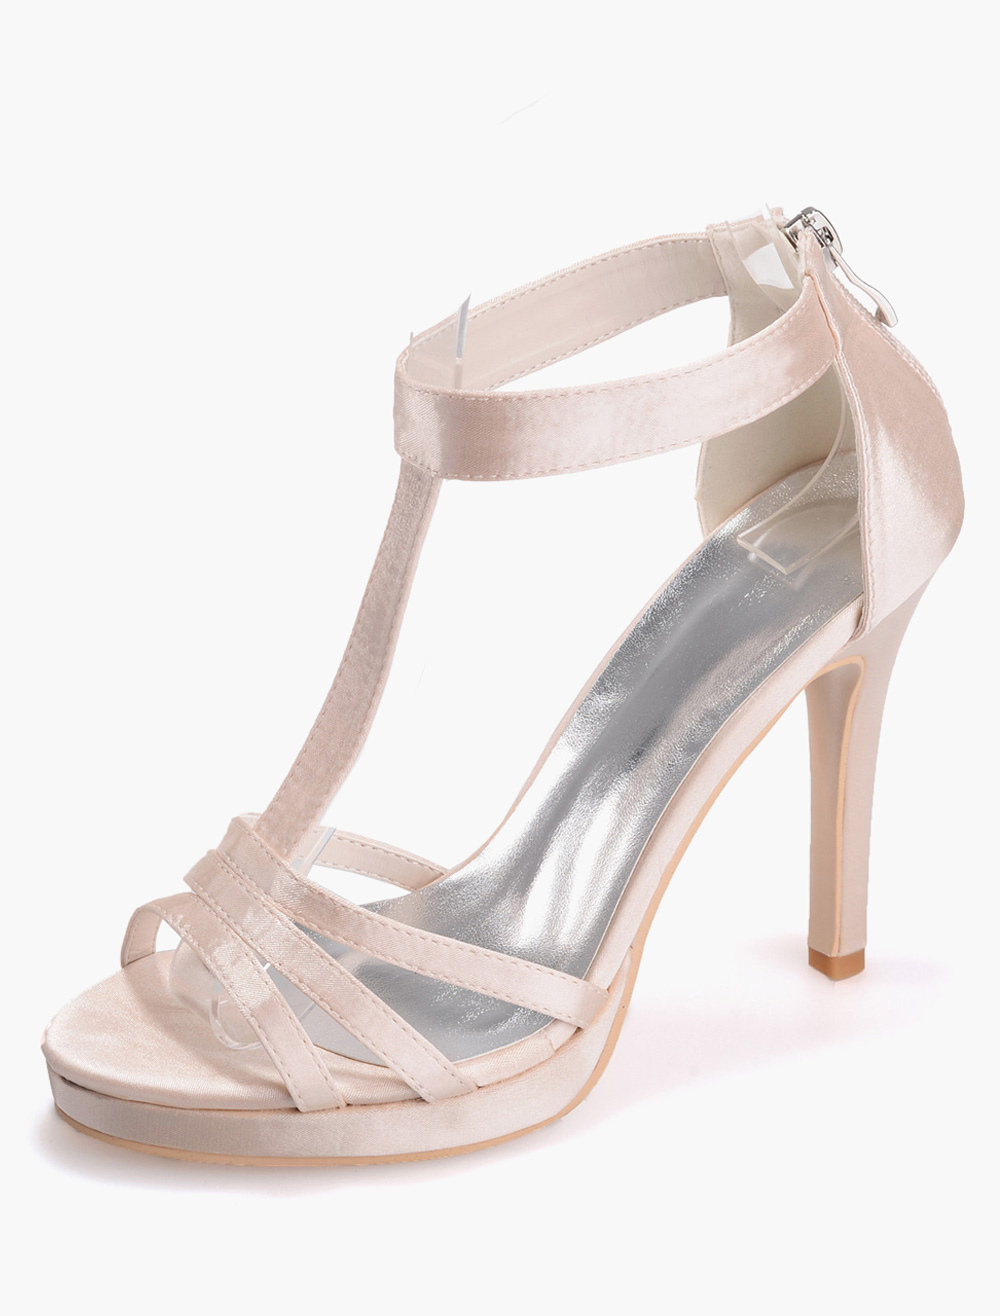 Gorgeous Zipper Open Toe Satin Evening and Bridal Sandals